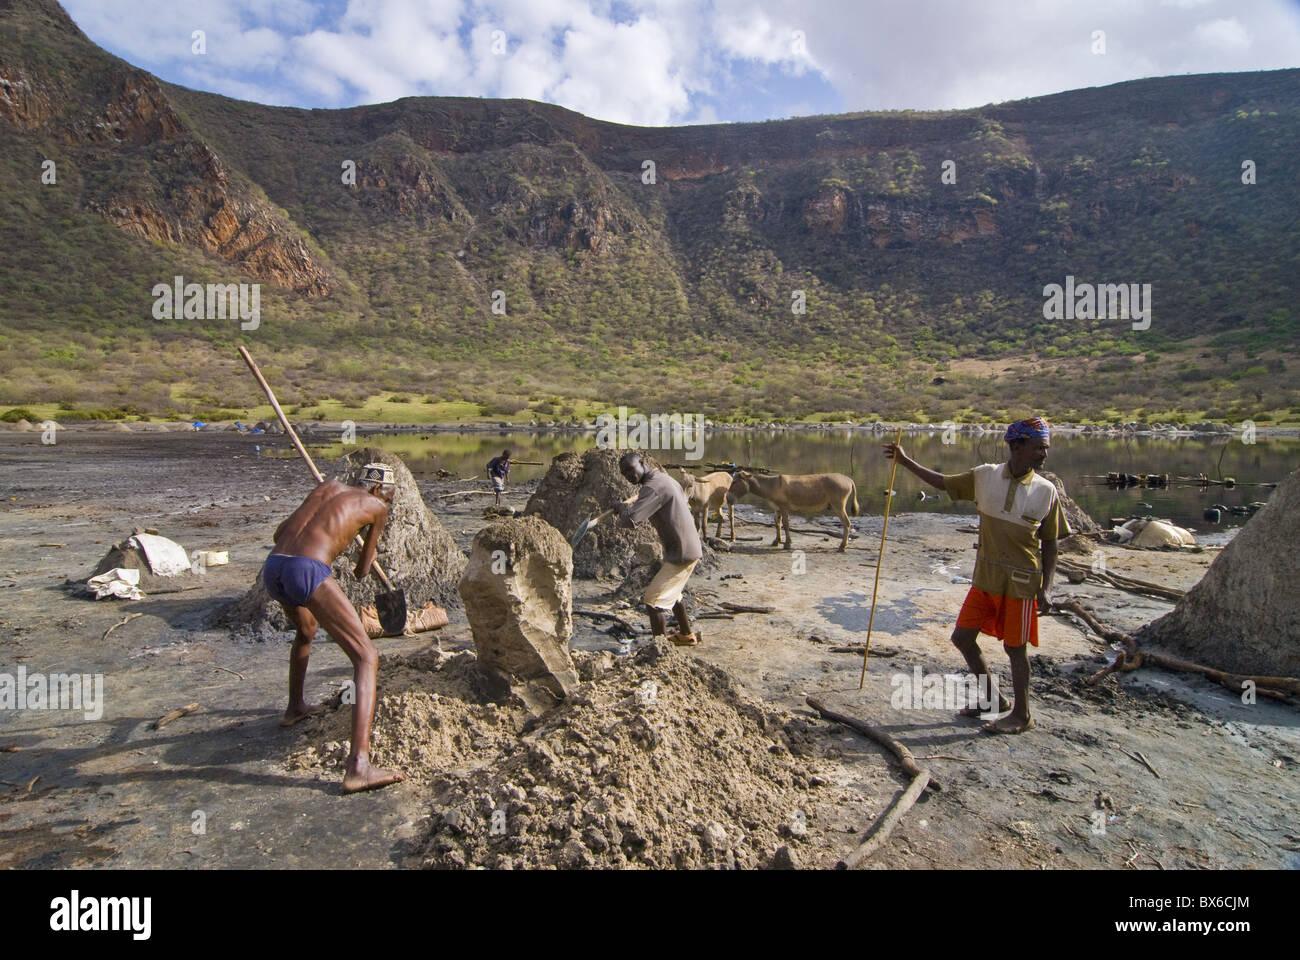 Workers digging for salt, El Sod crater lake, Ethiopia, Africa - Stock Image